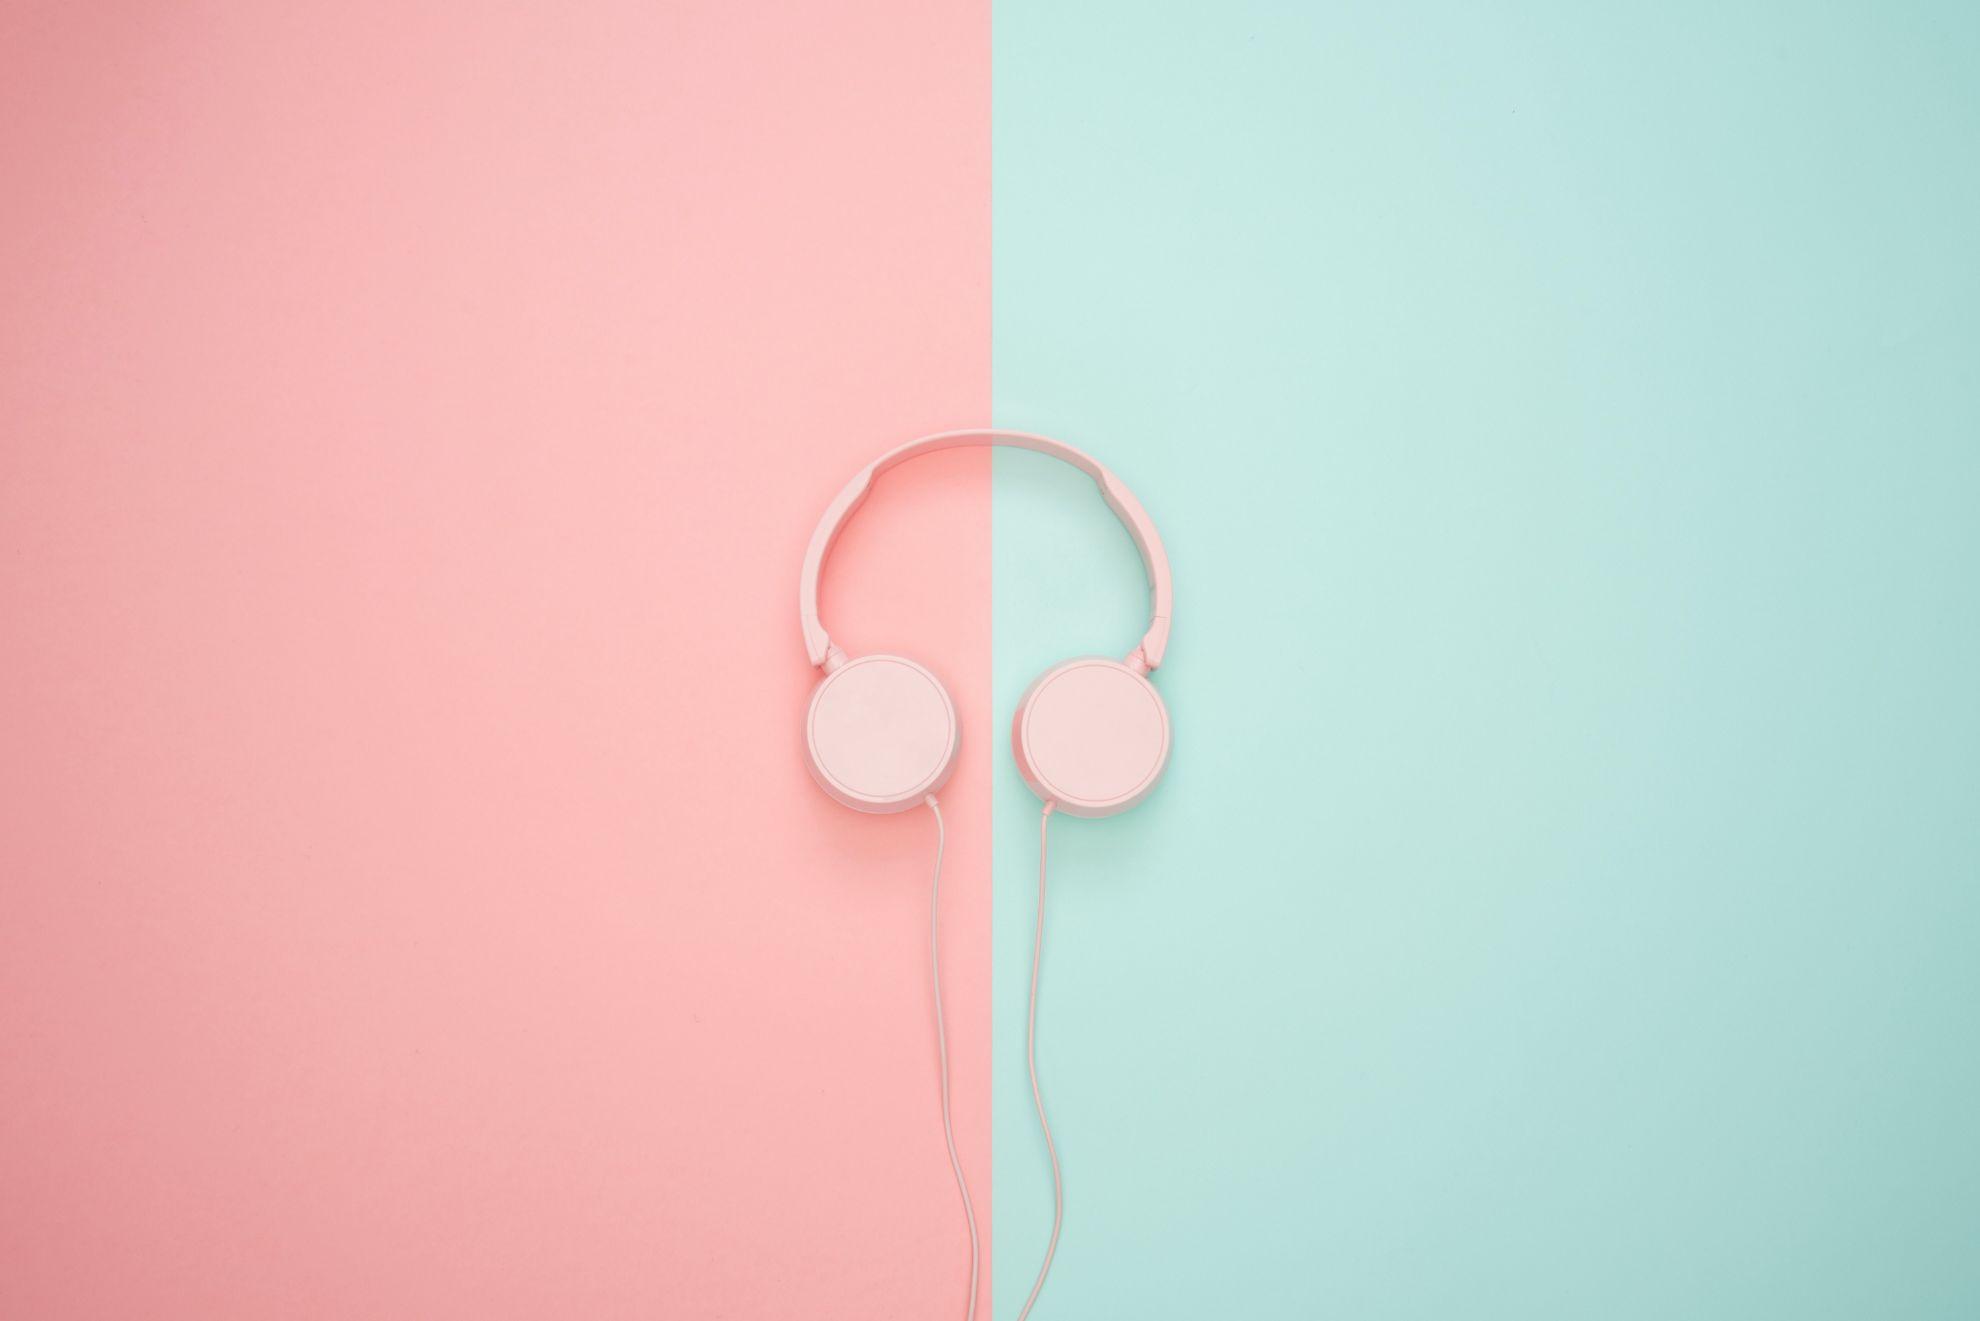 Навушники та гарнітури